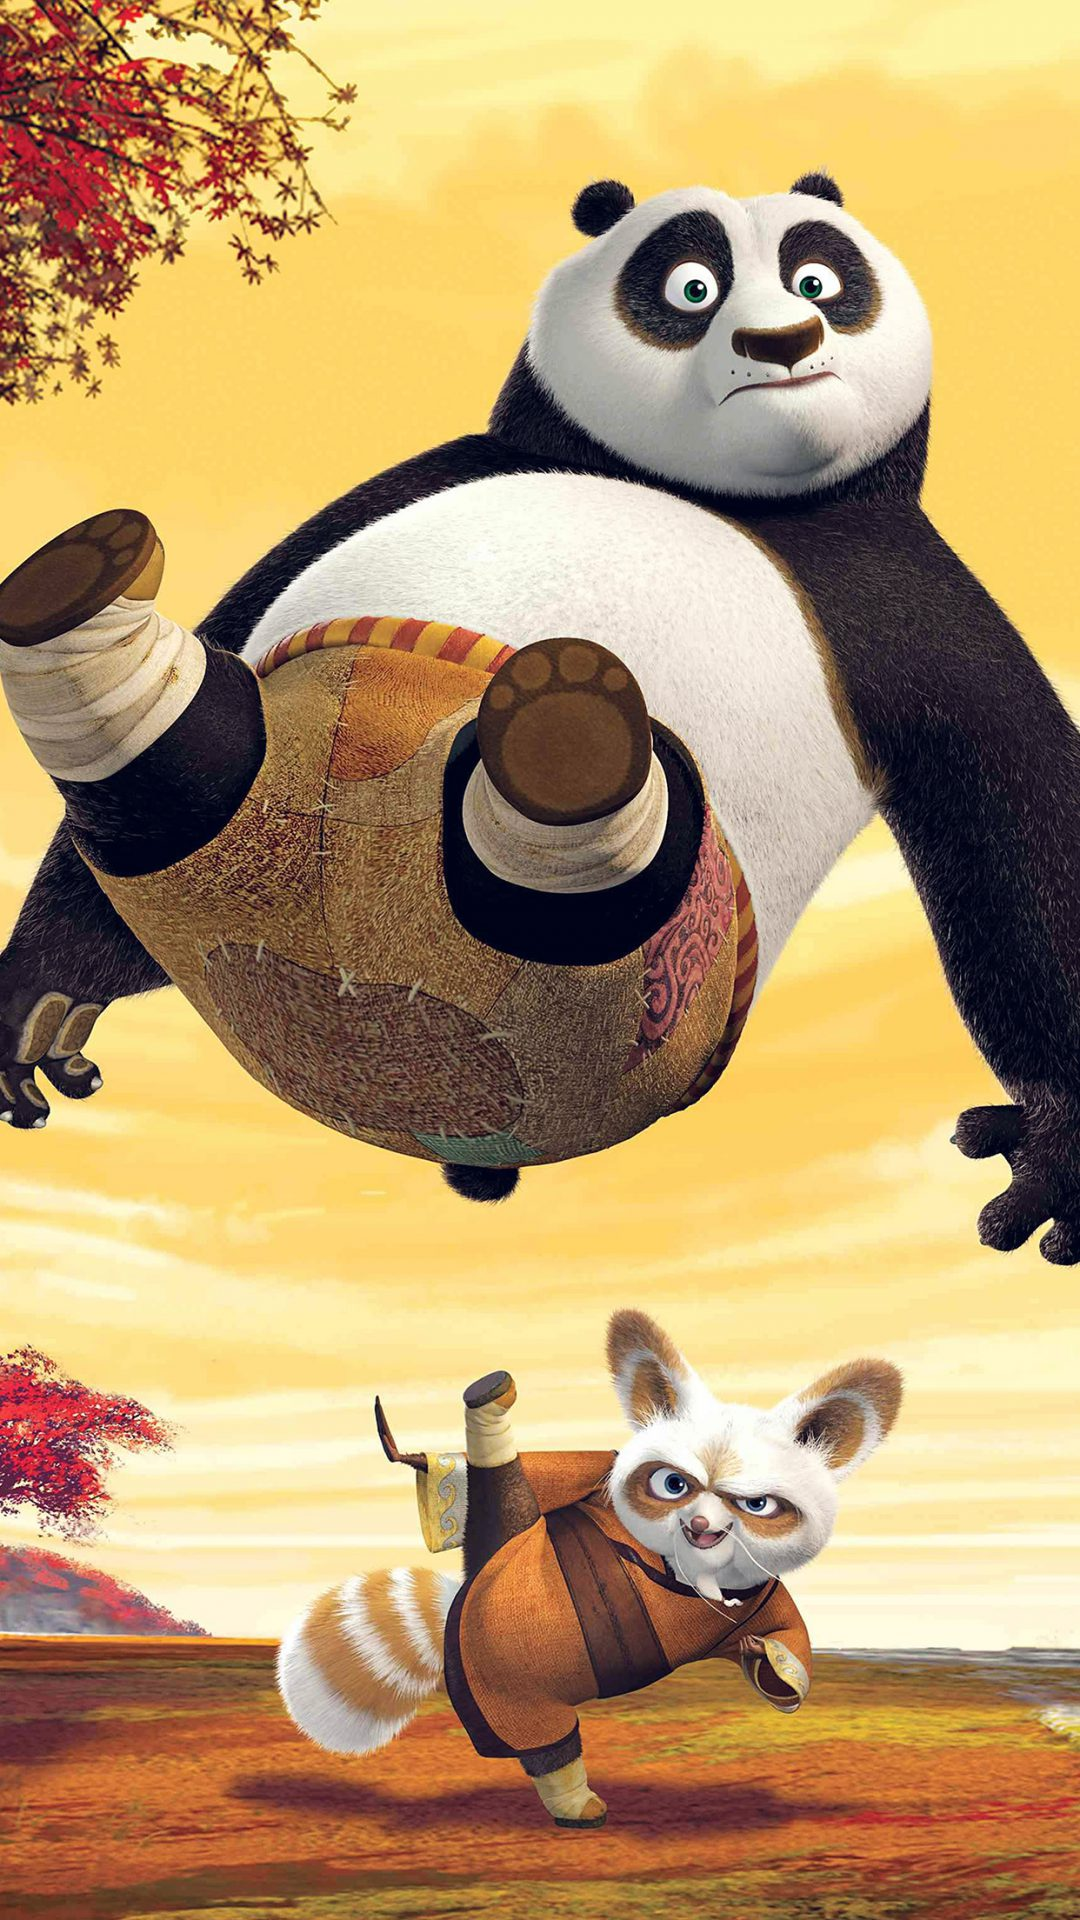 IPhone 8 Kungfu Panda Dreamworks Art Kick Cute Anime